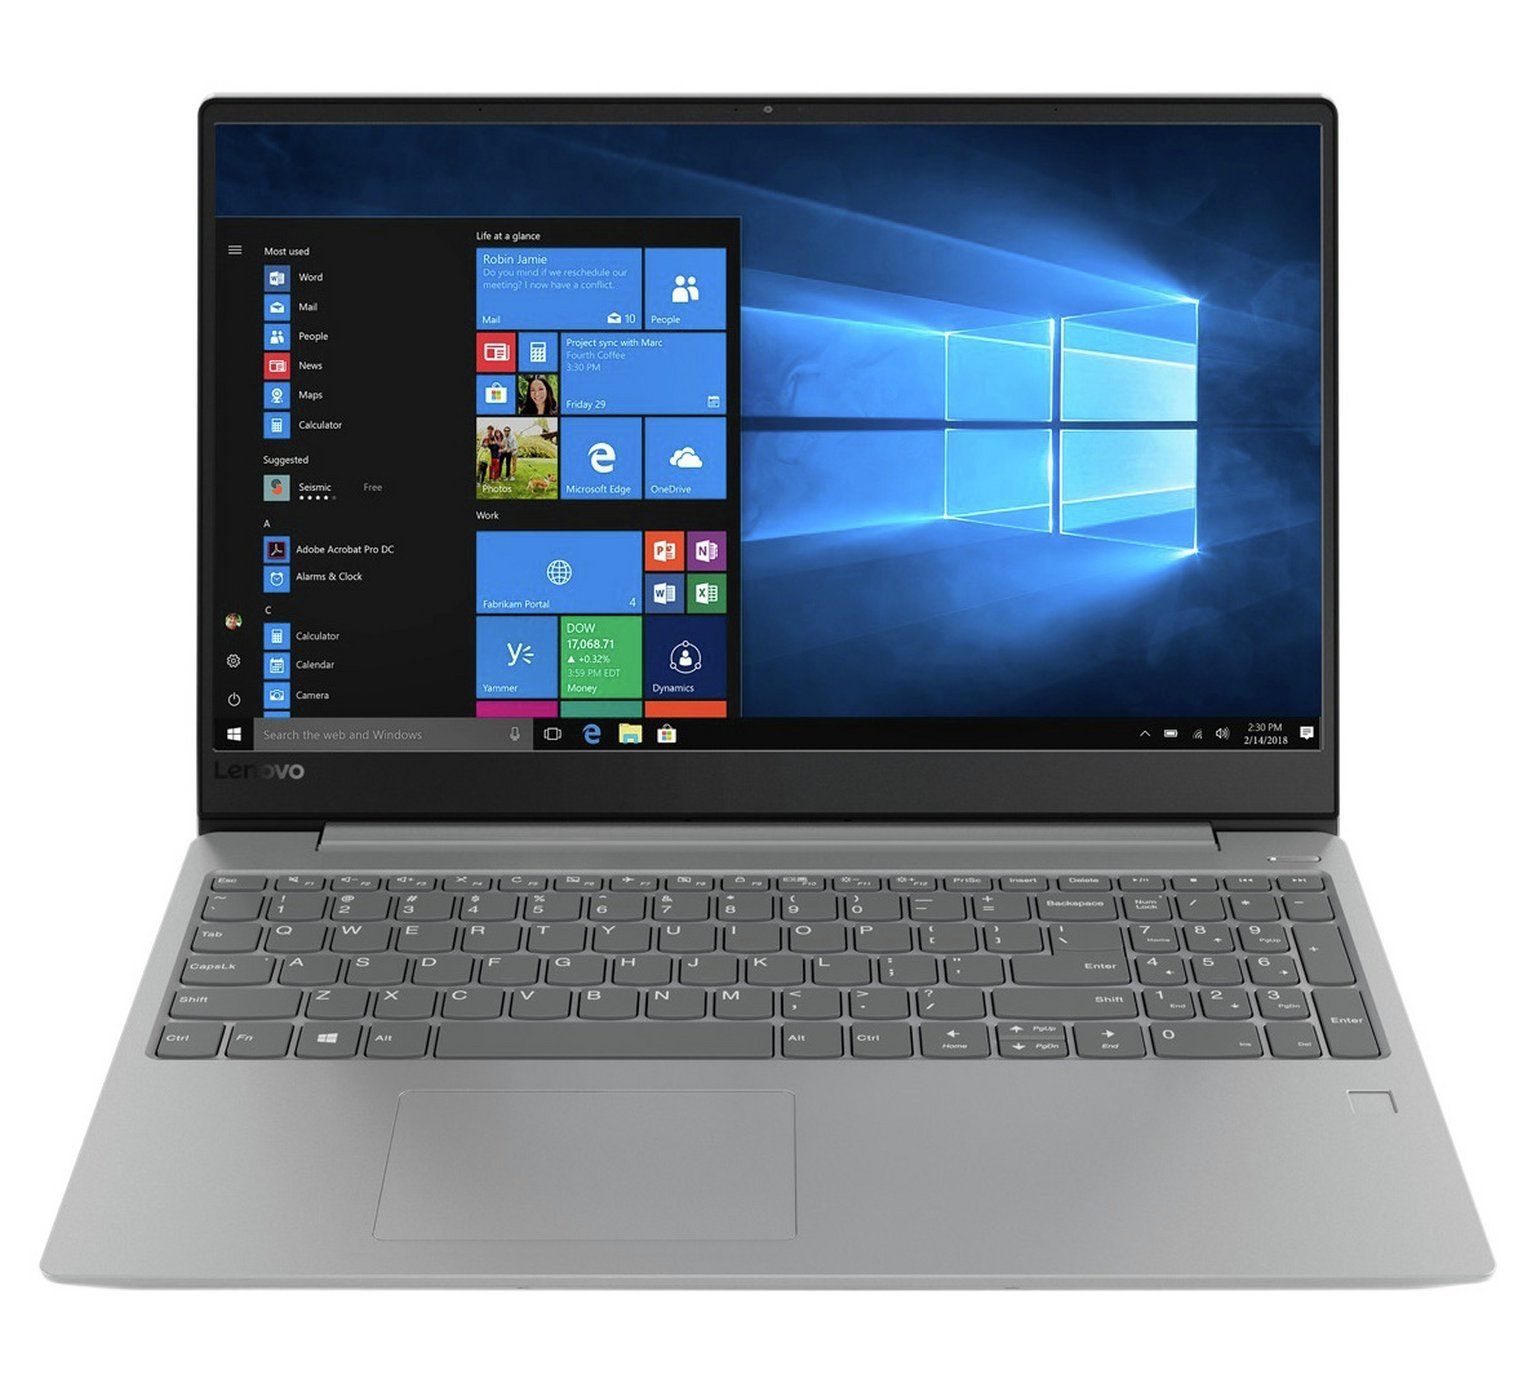 Lenovo IdeaPad 330S 15.6 Inch i5 8GB 256GB Laptop - Grey